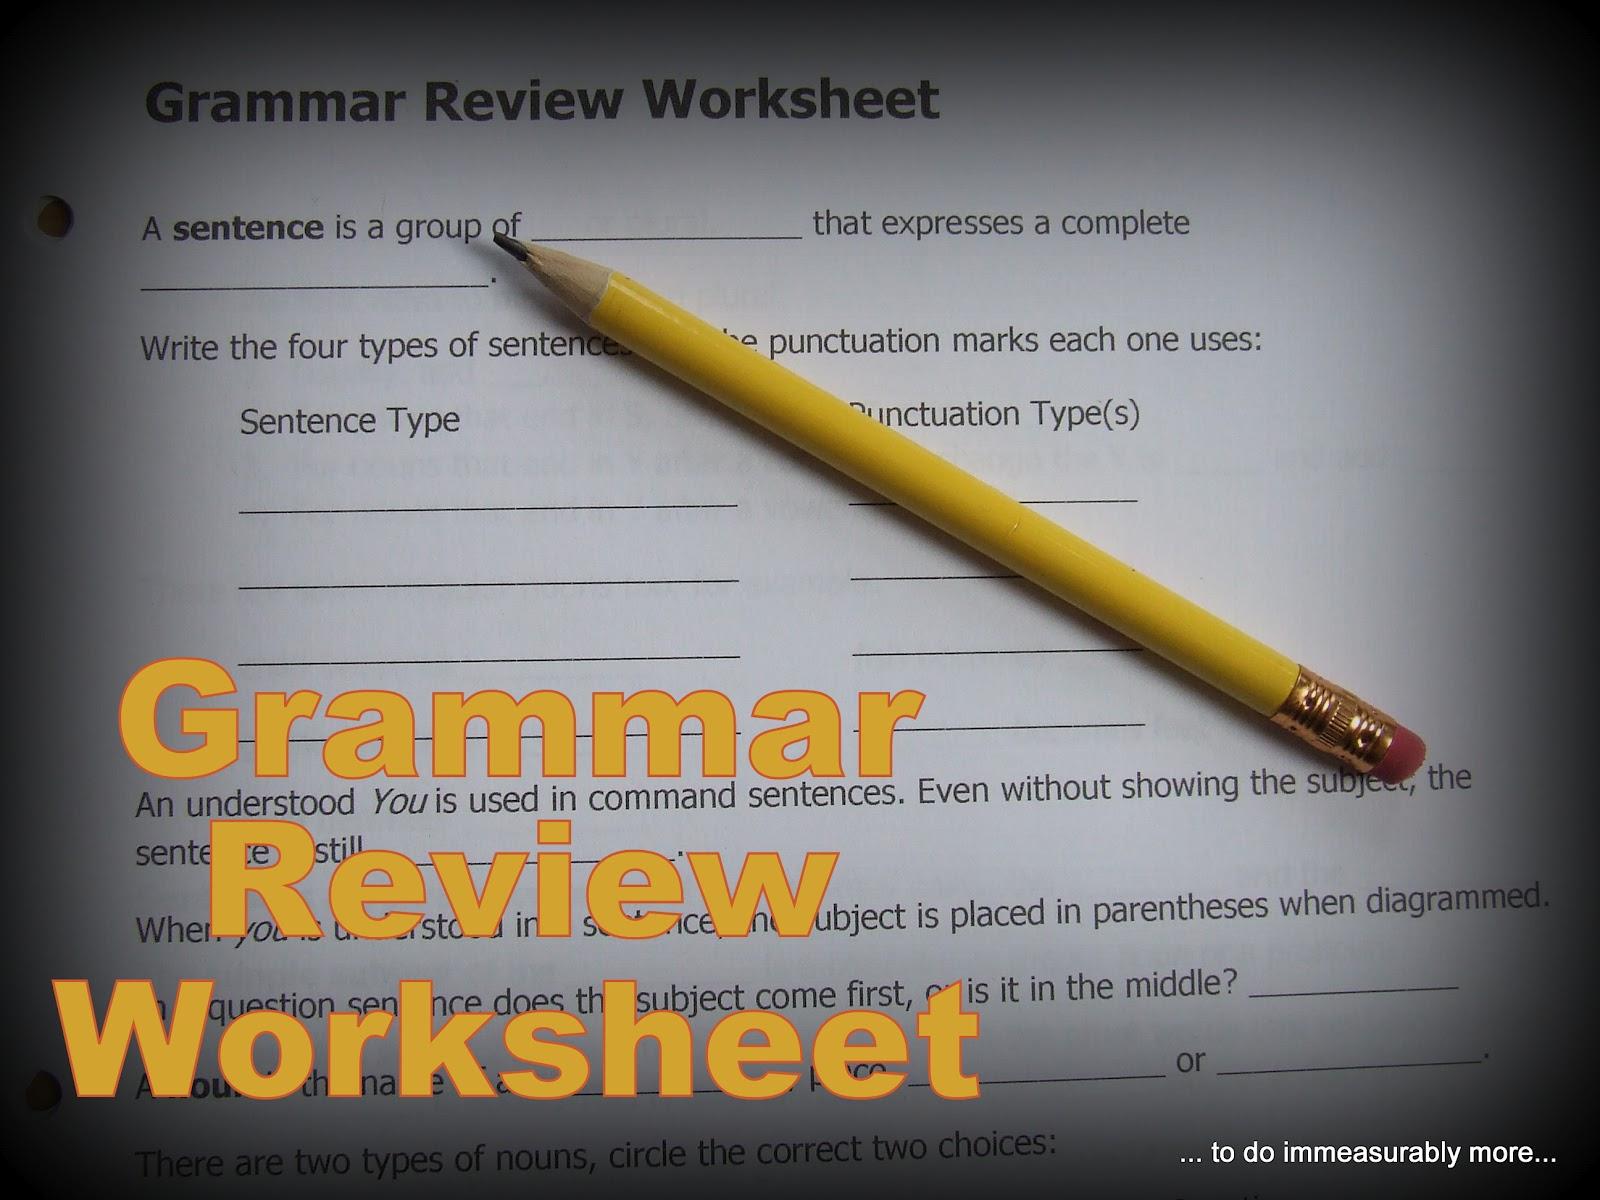 Do Measurably More Grammar Review Worksheet Printable